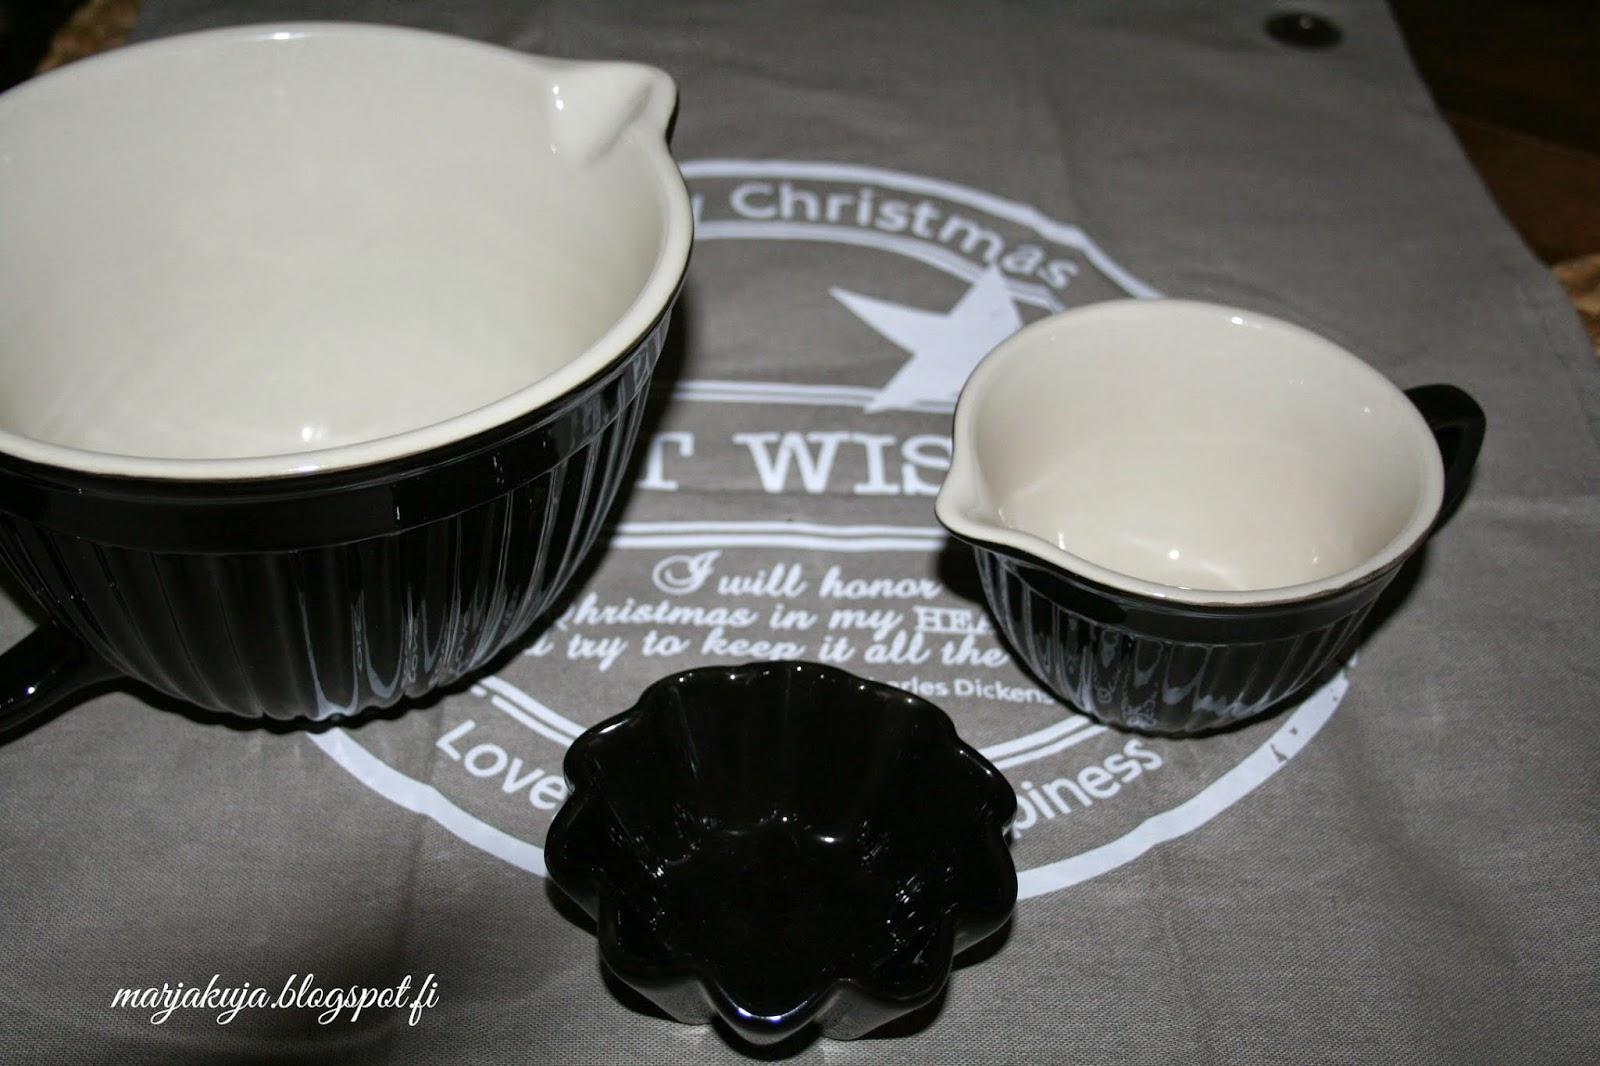 Lb Laursen keraamiset kulhot ja harmaa keittiö pyyhe